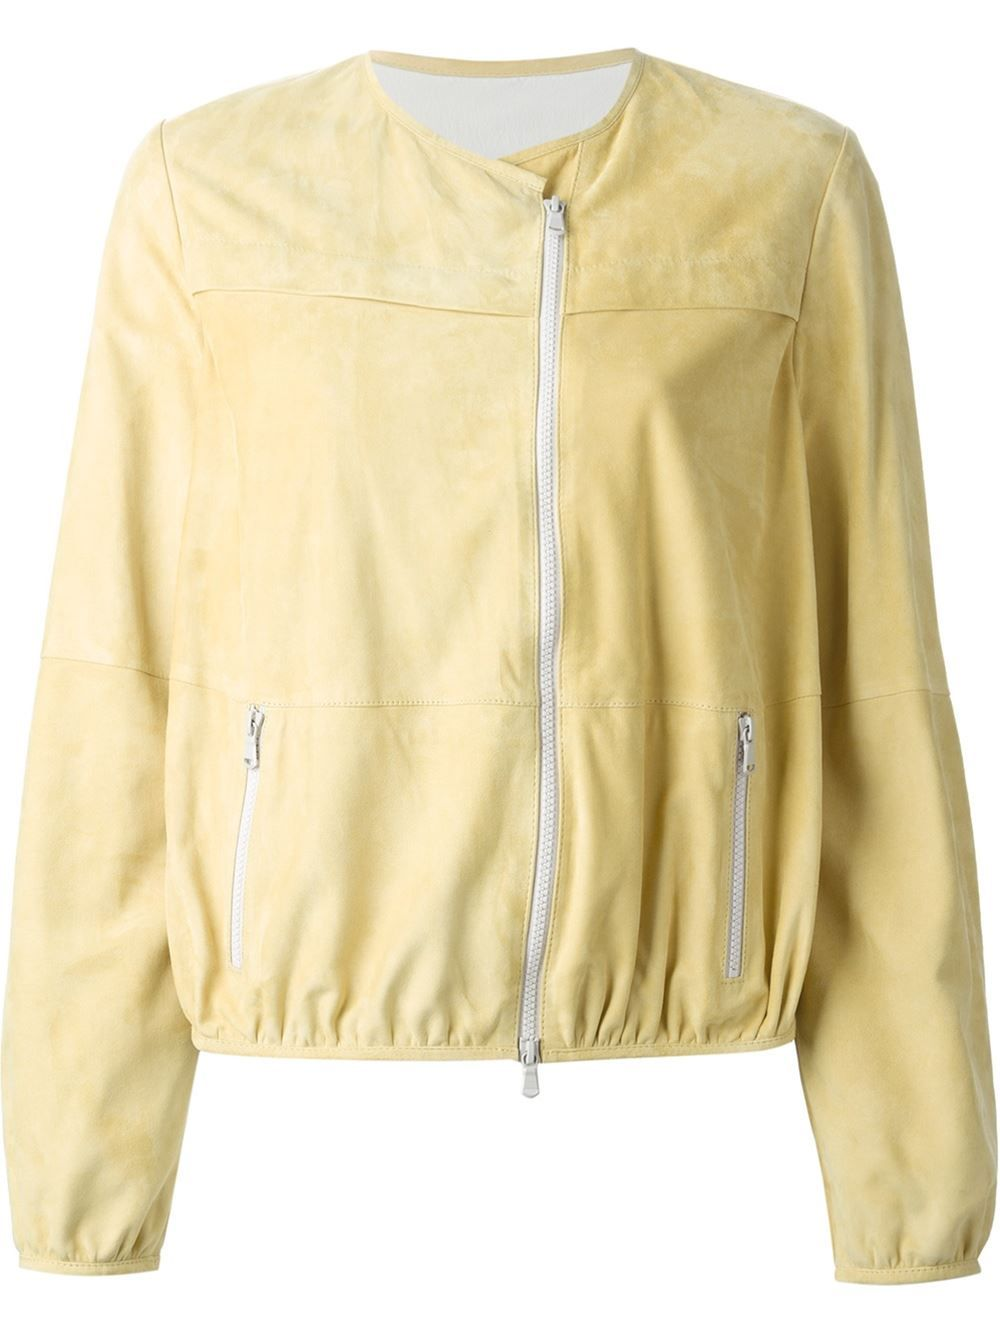 Brunello Cucinelli Suede Bomber Jacket Spinnaker 101 Farfetch Com Suede Bomber Jacket Designer Leather Jackets Leather Jackets Online [ 1334 x 1000 Pixel ]